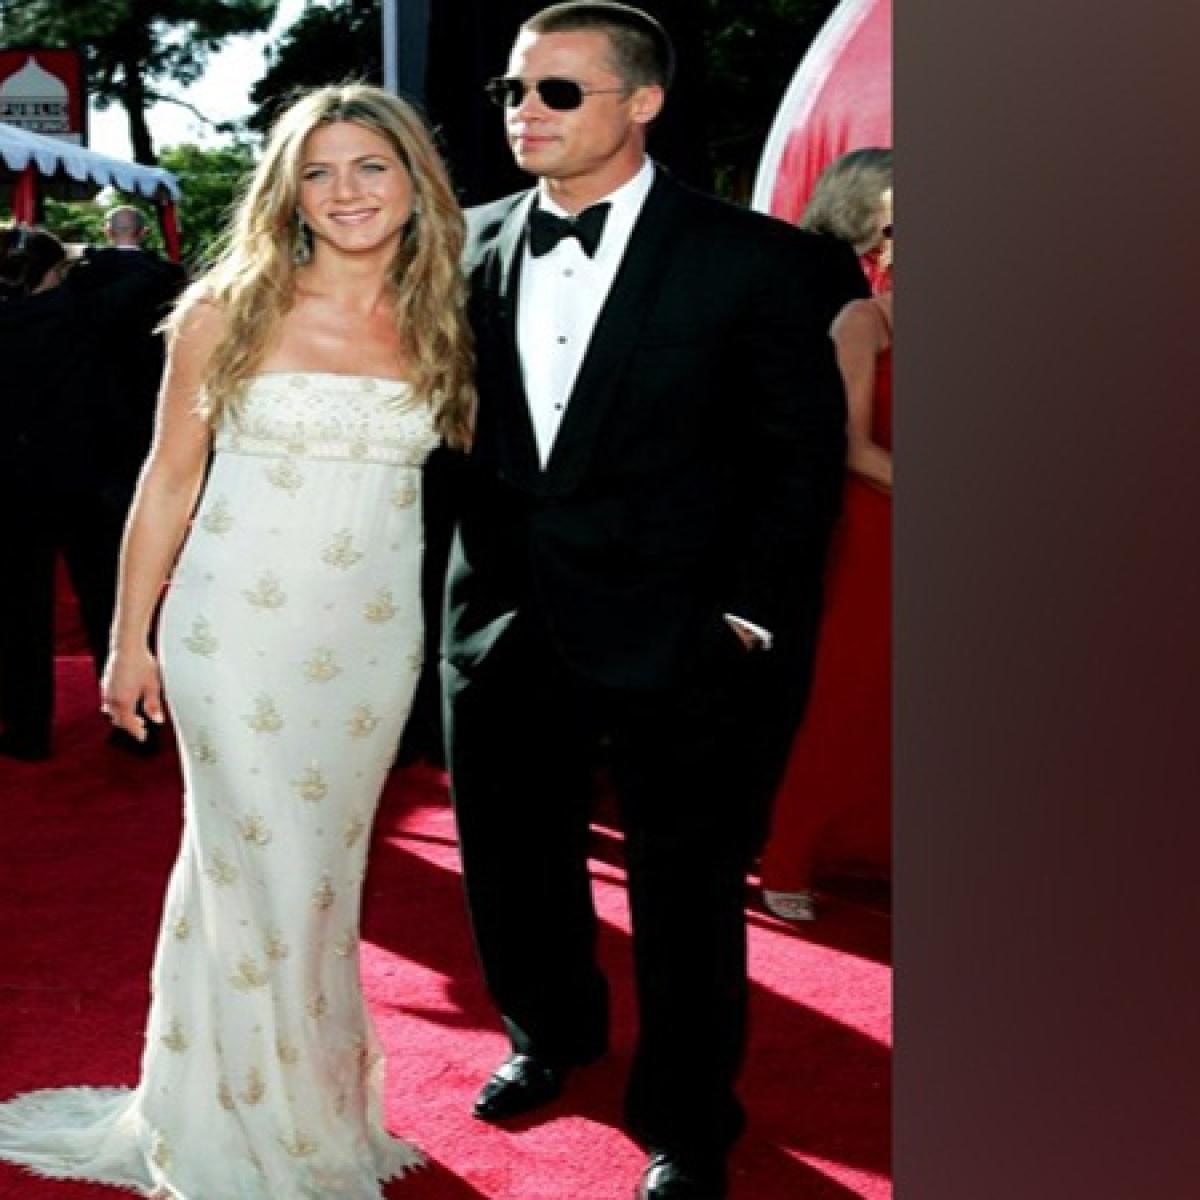 Jennifer Aniston, Brad Pitt have a 'real bond' after years of split